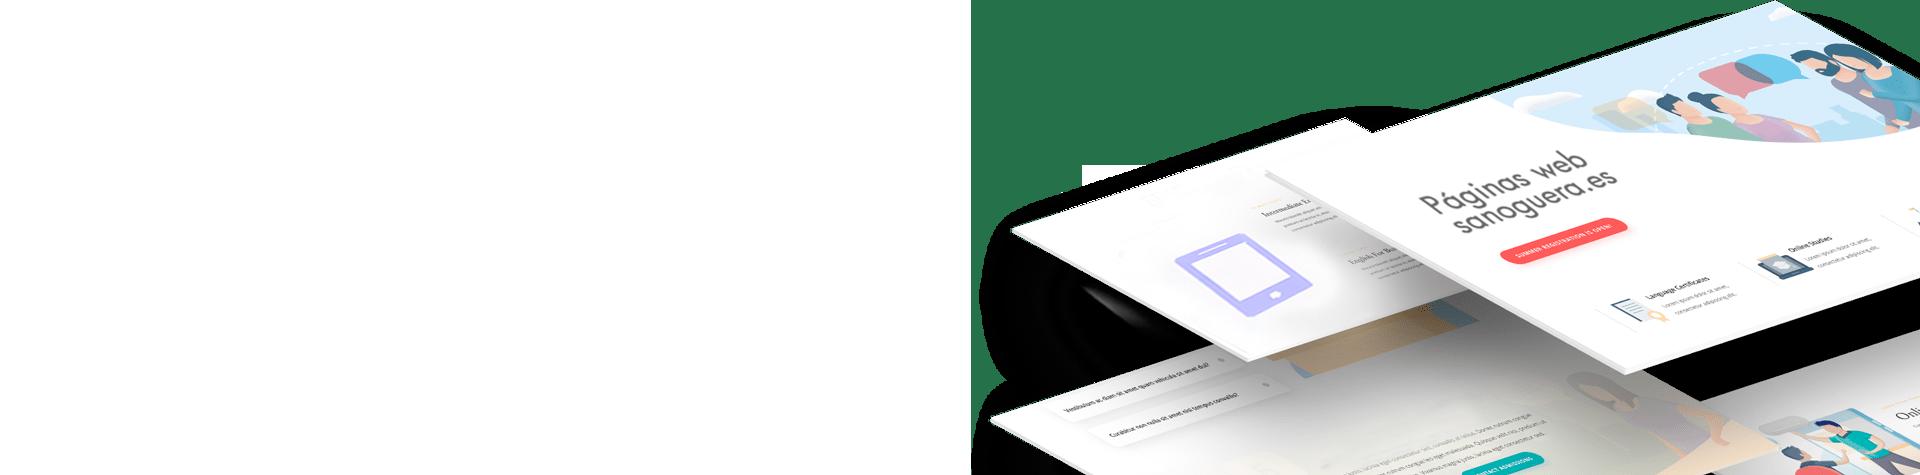 webs empresas Sanoguera